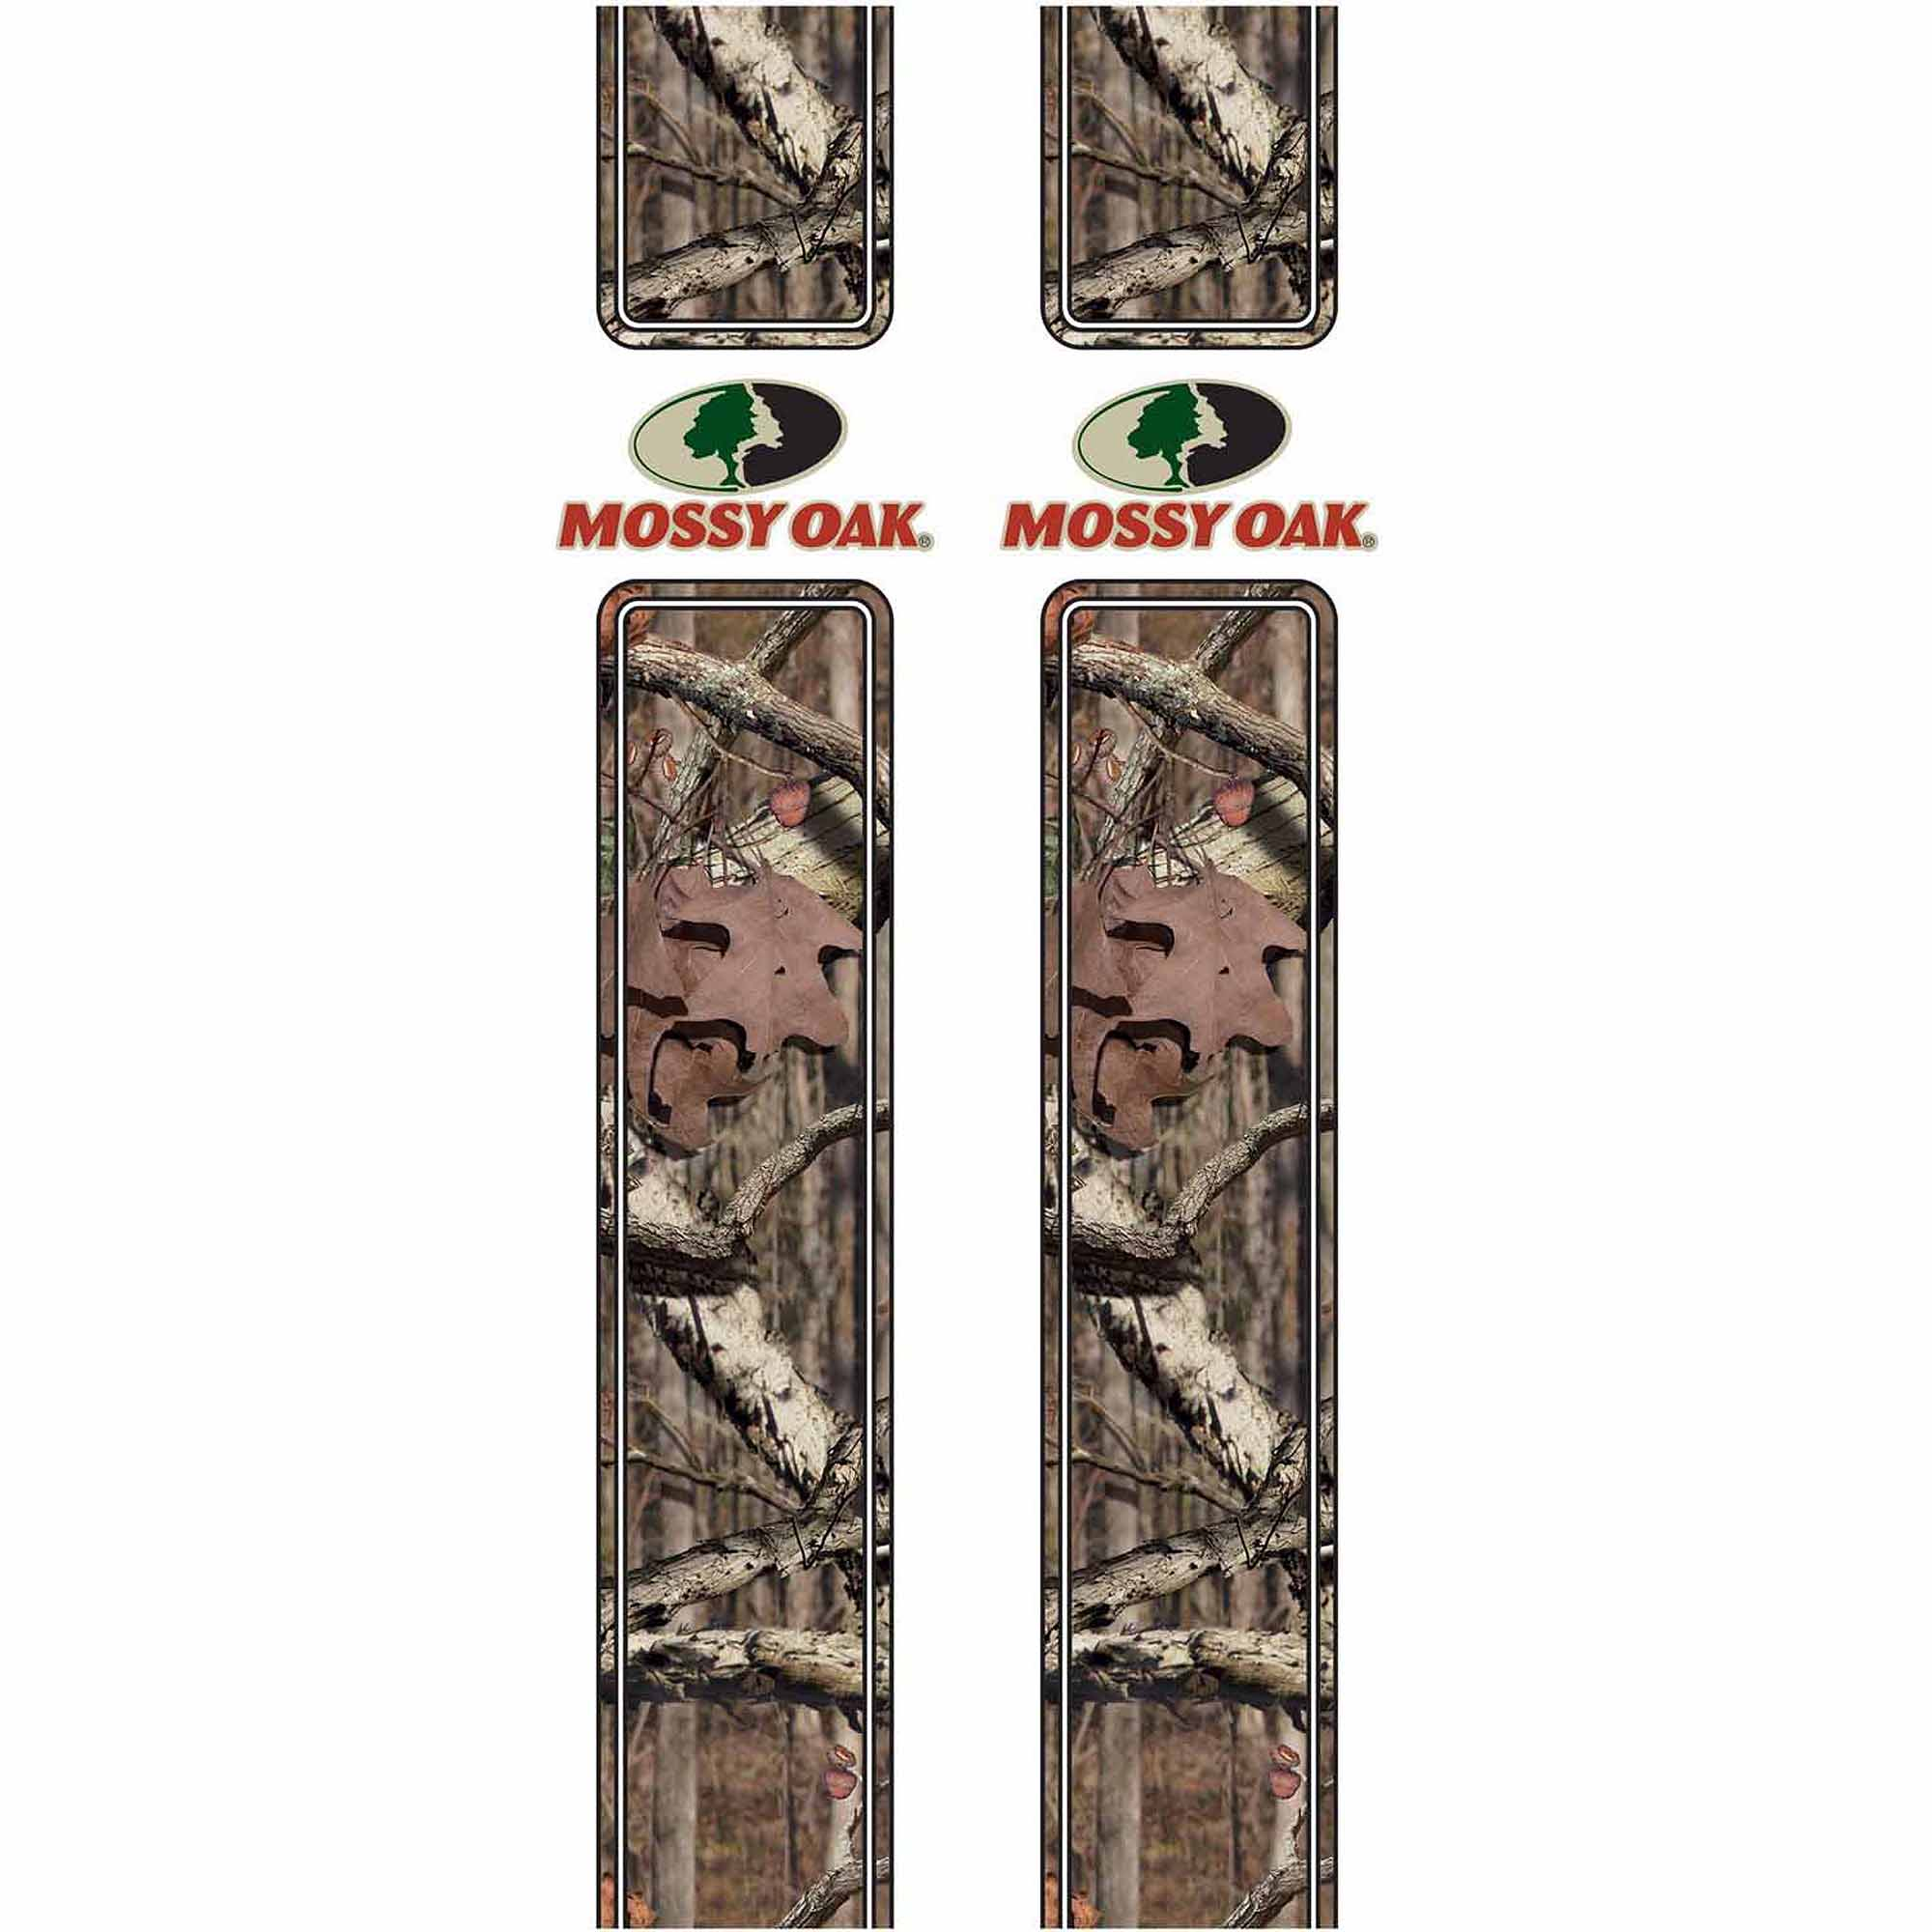 Mossy Oak Graphics 16001-BI Break-Up Infinity Rear Quarter Panel Graphics with Mossy Oak Logo Multi-Colored